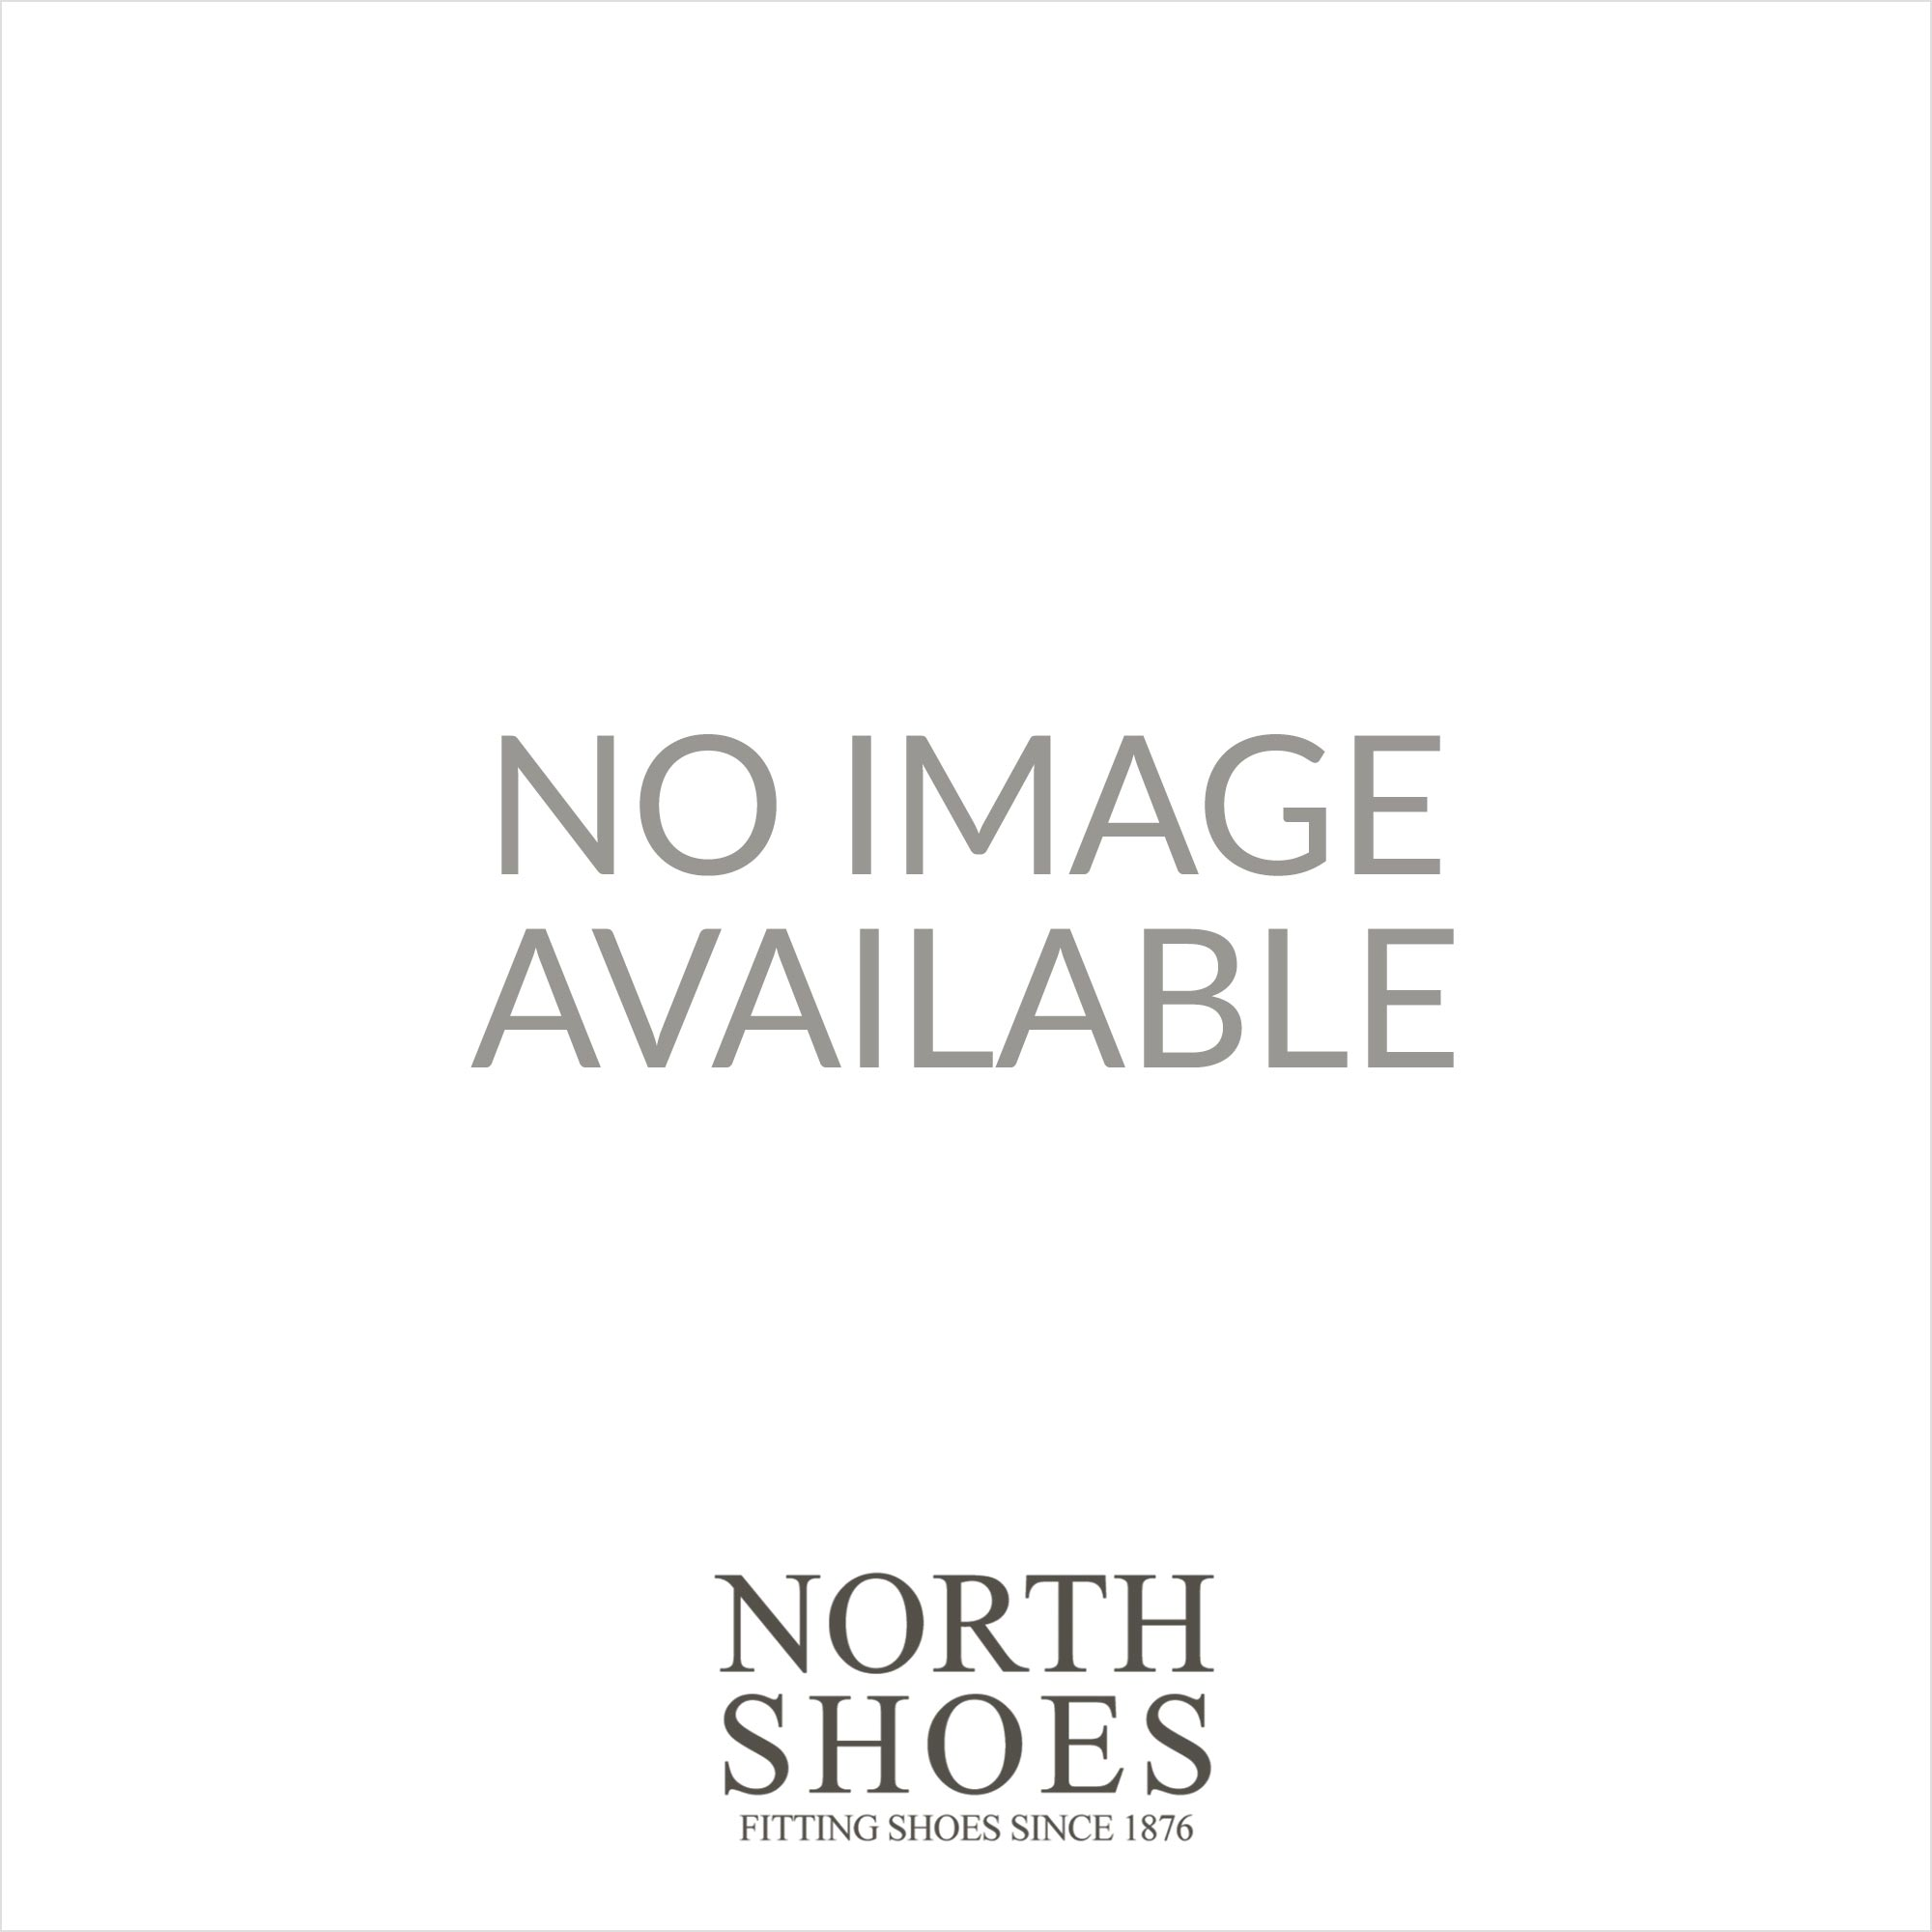 949b69b19 Rieker Swetlana Z0444-24 Tan Womens Warm Winter Ankle Boots - Rieker from  North Shoes UK